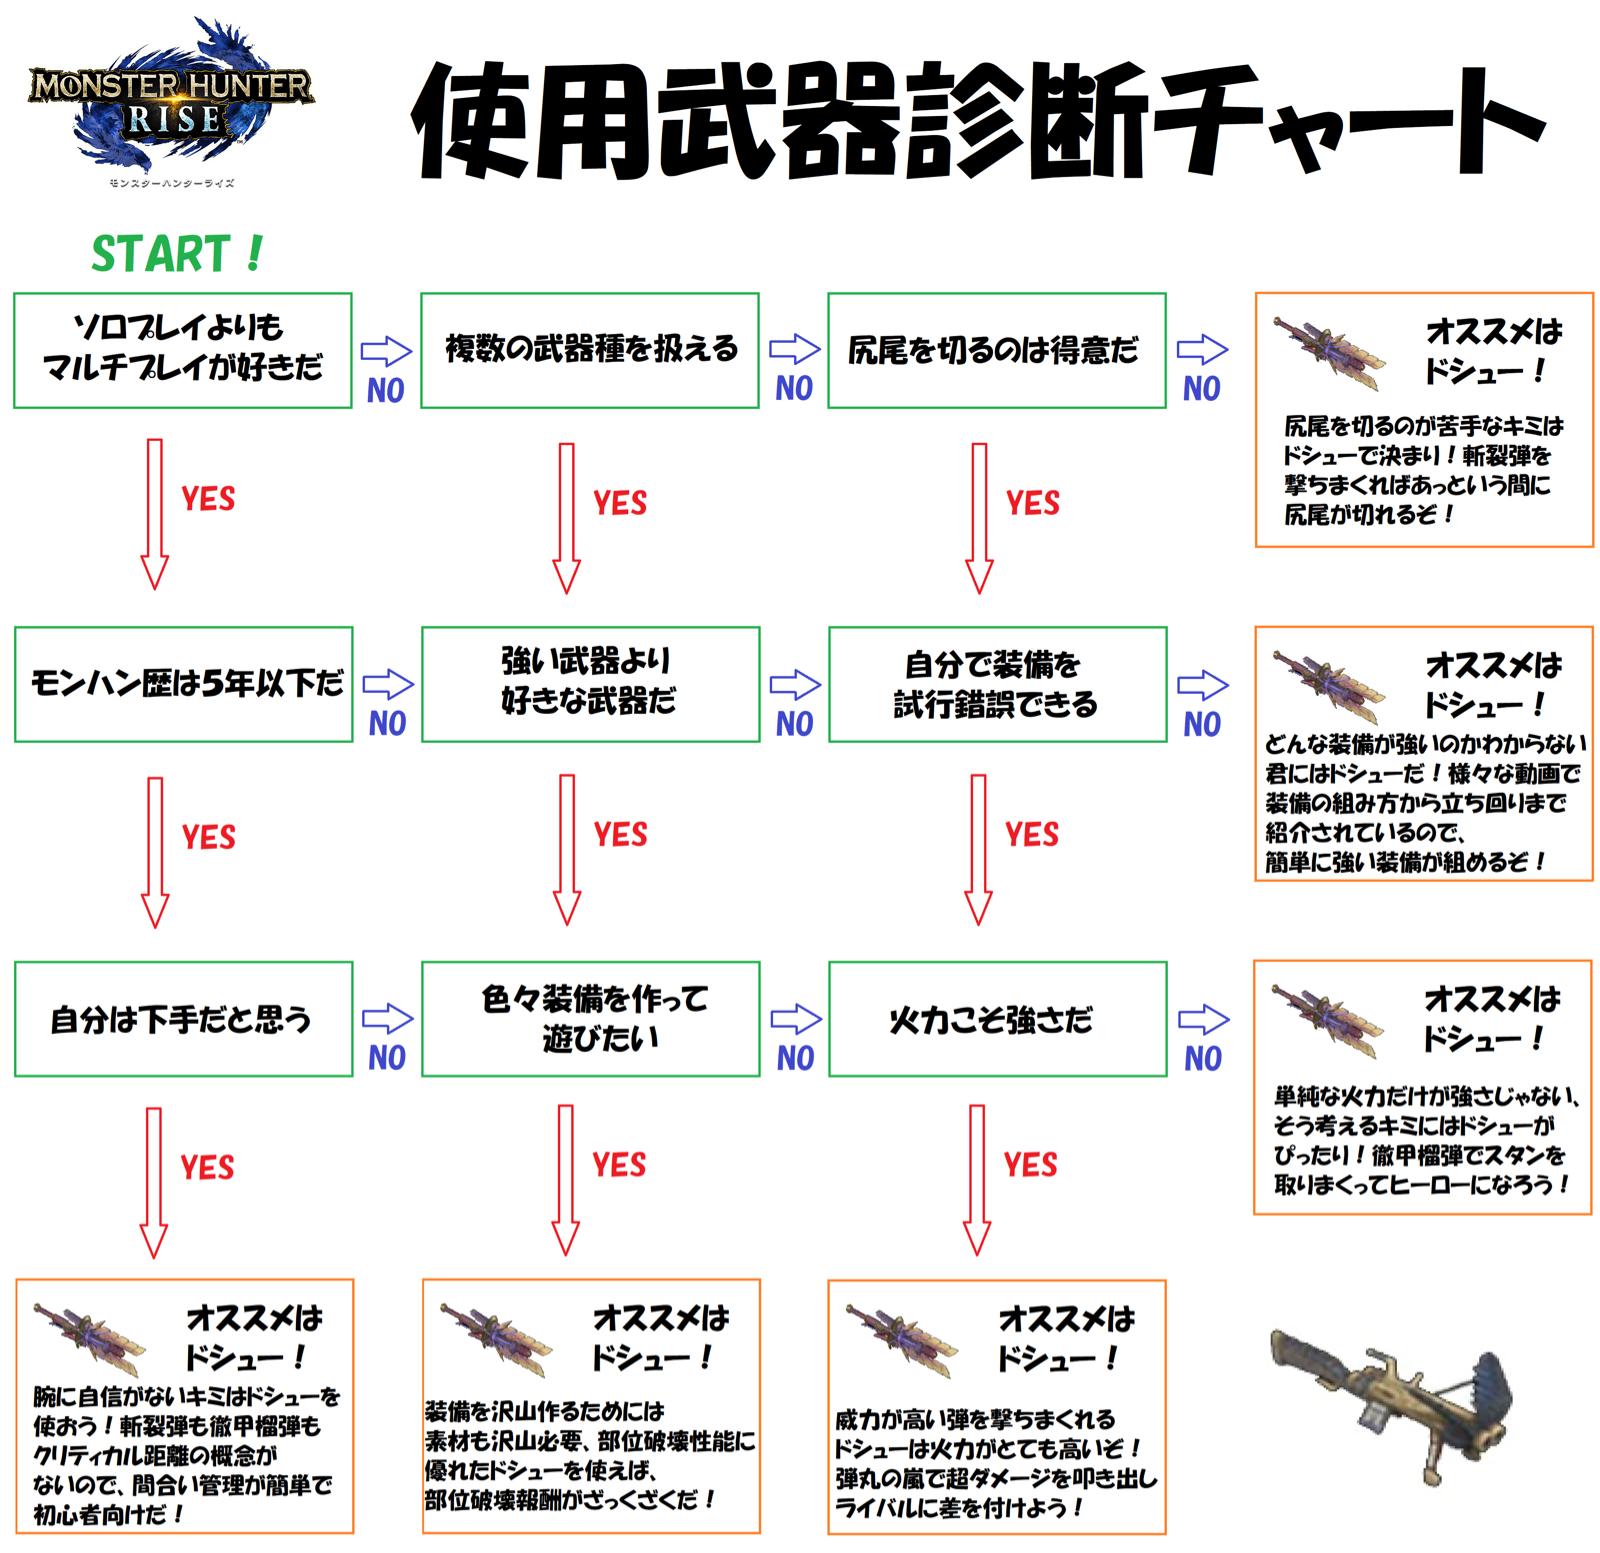 https://livedoor.blogimg.jp/childman369/imgs/5/8/5898b1e5.png